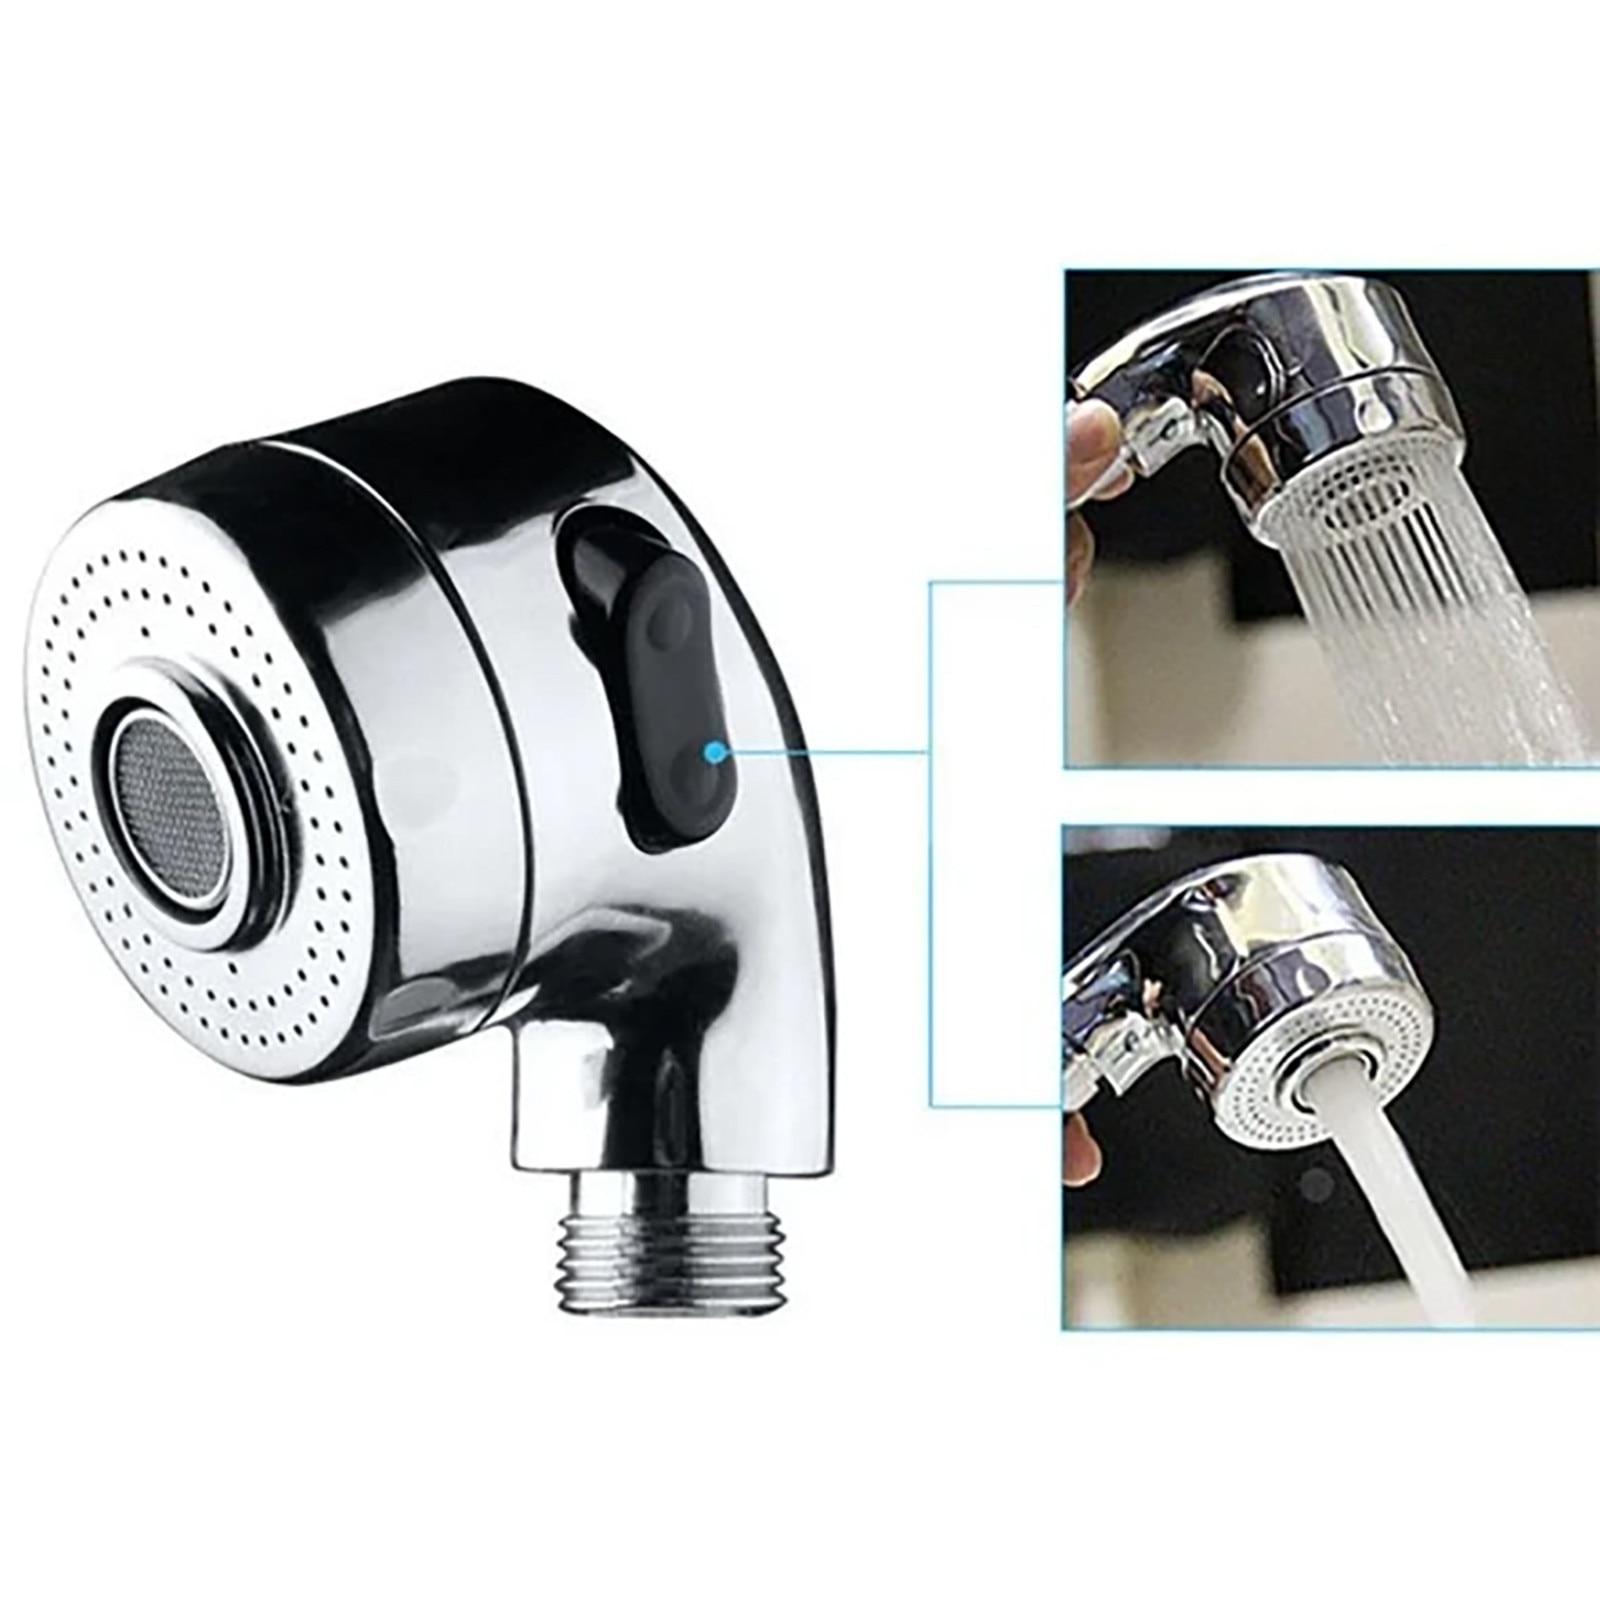 Hac87d55c00104a8d991338da7ca6e9fbS Sink Tap Faucet Kitchens Shampoo Shower Heads Bathroom Spray Drain Filter Hose For Household Bathroom Accessories